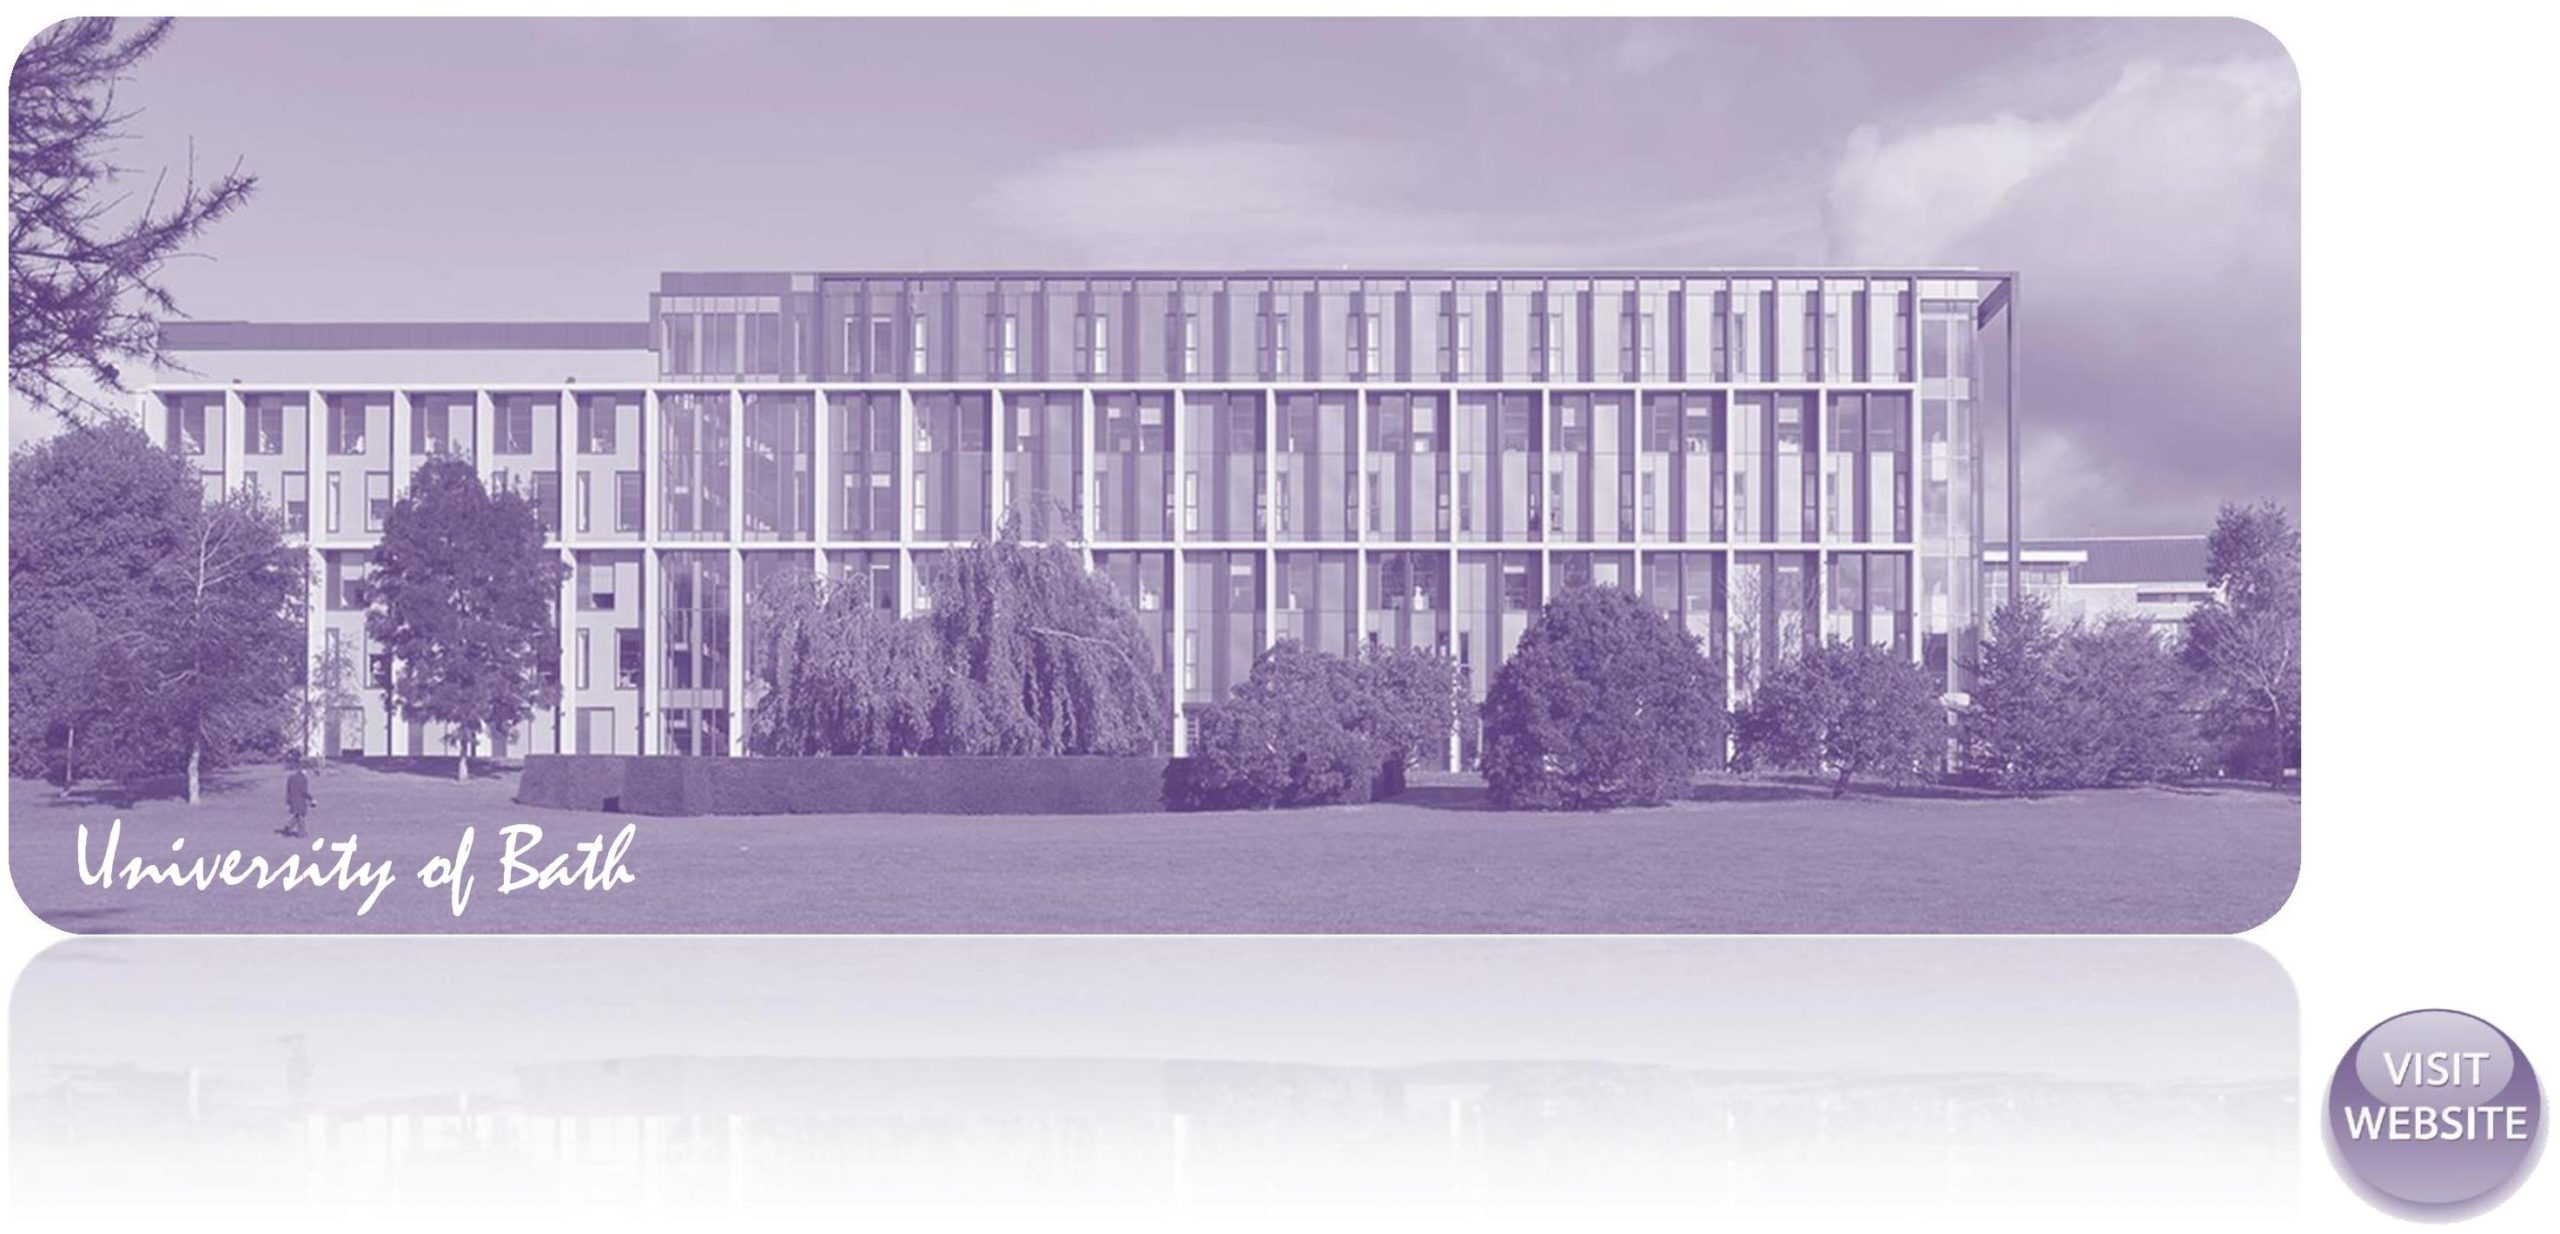 University of Bath UK